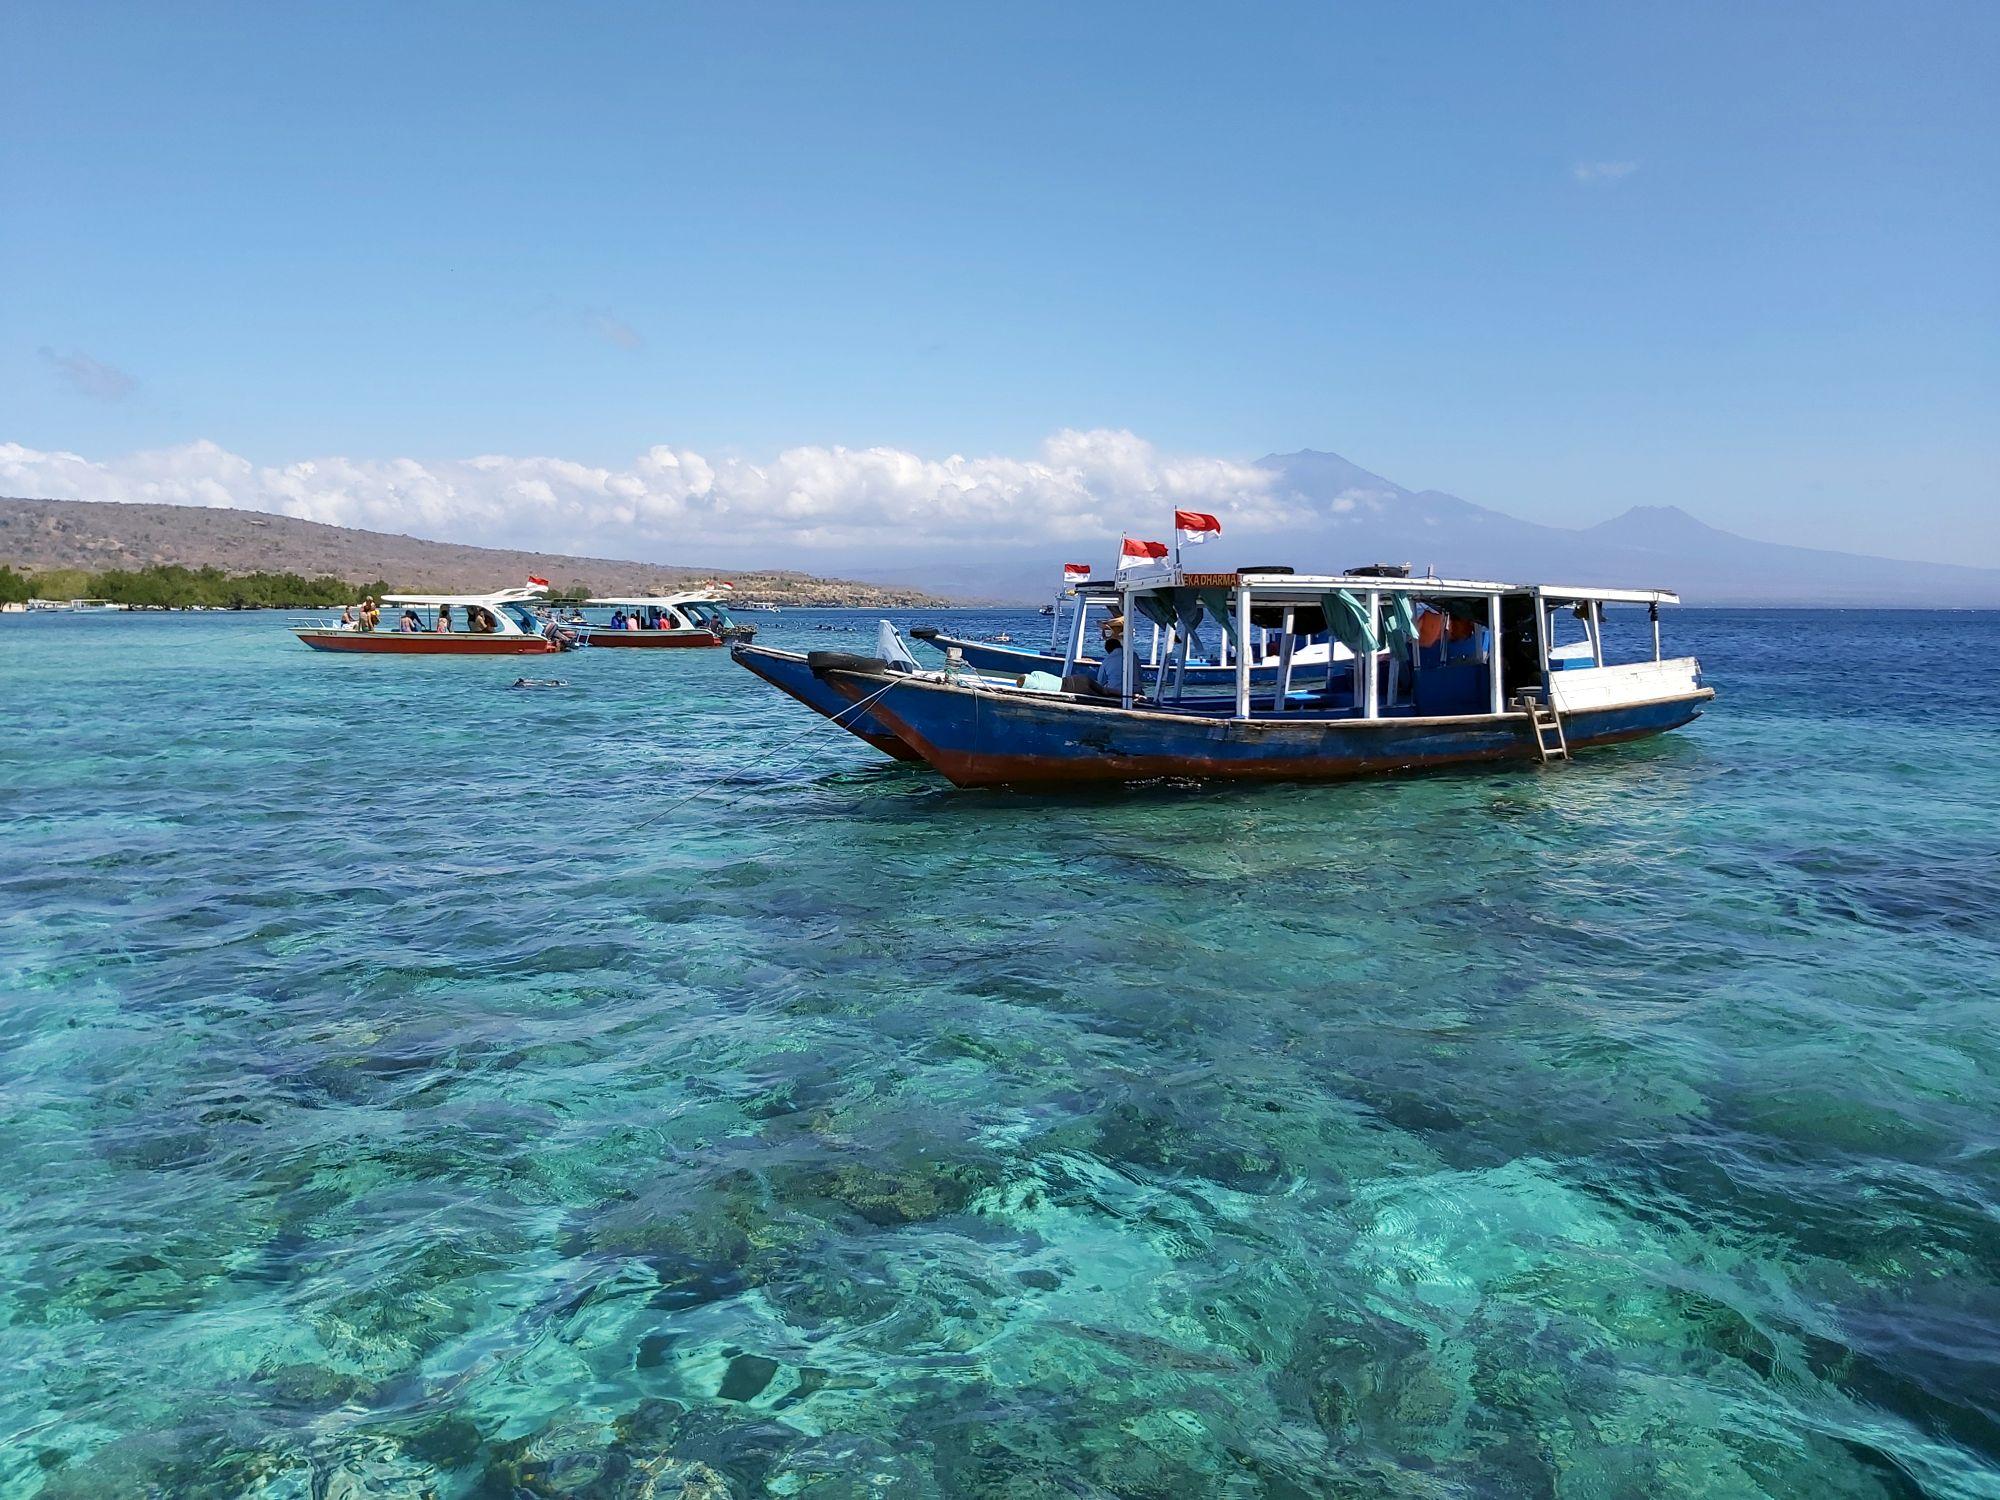 Indonesie Bali Pemuteran Snorkelen bij Menjangan Island